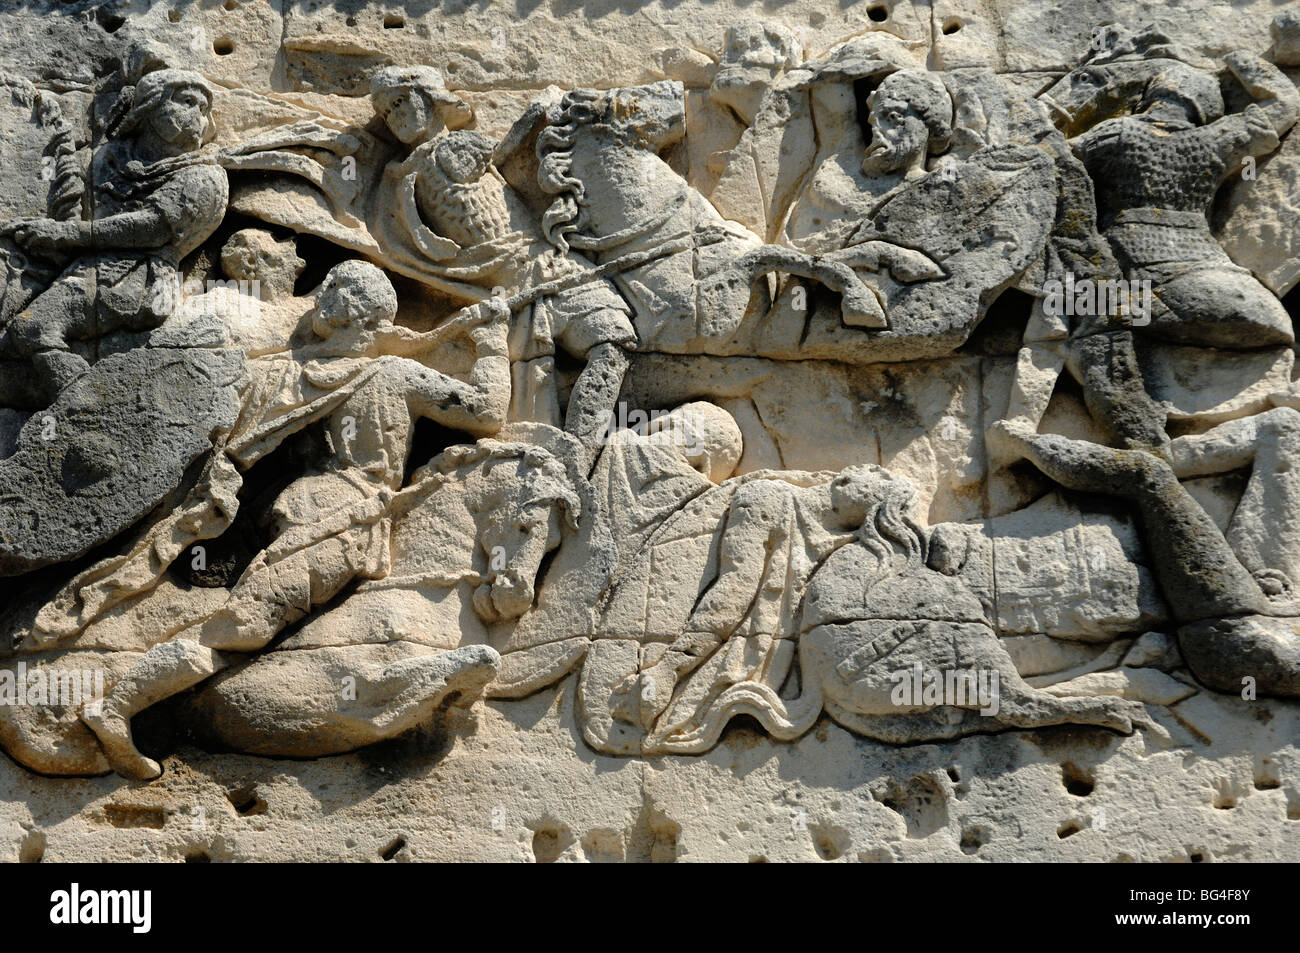 Roman & Gallic Soldiers in Battle Scene on Roman Arc de Triomphe or Triumphal Arch, Orange, Provence, France - Stock Image